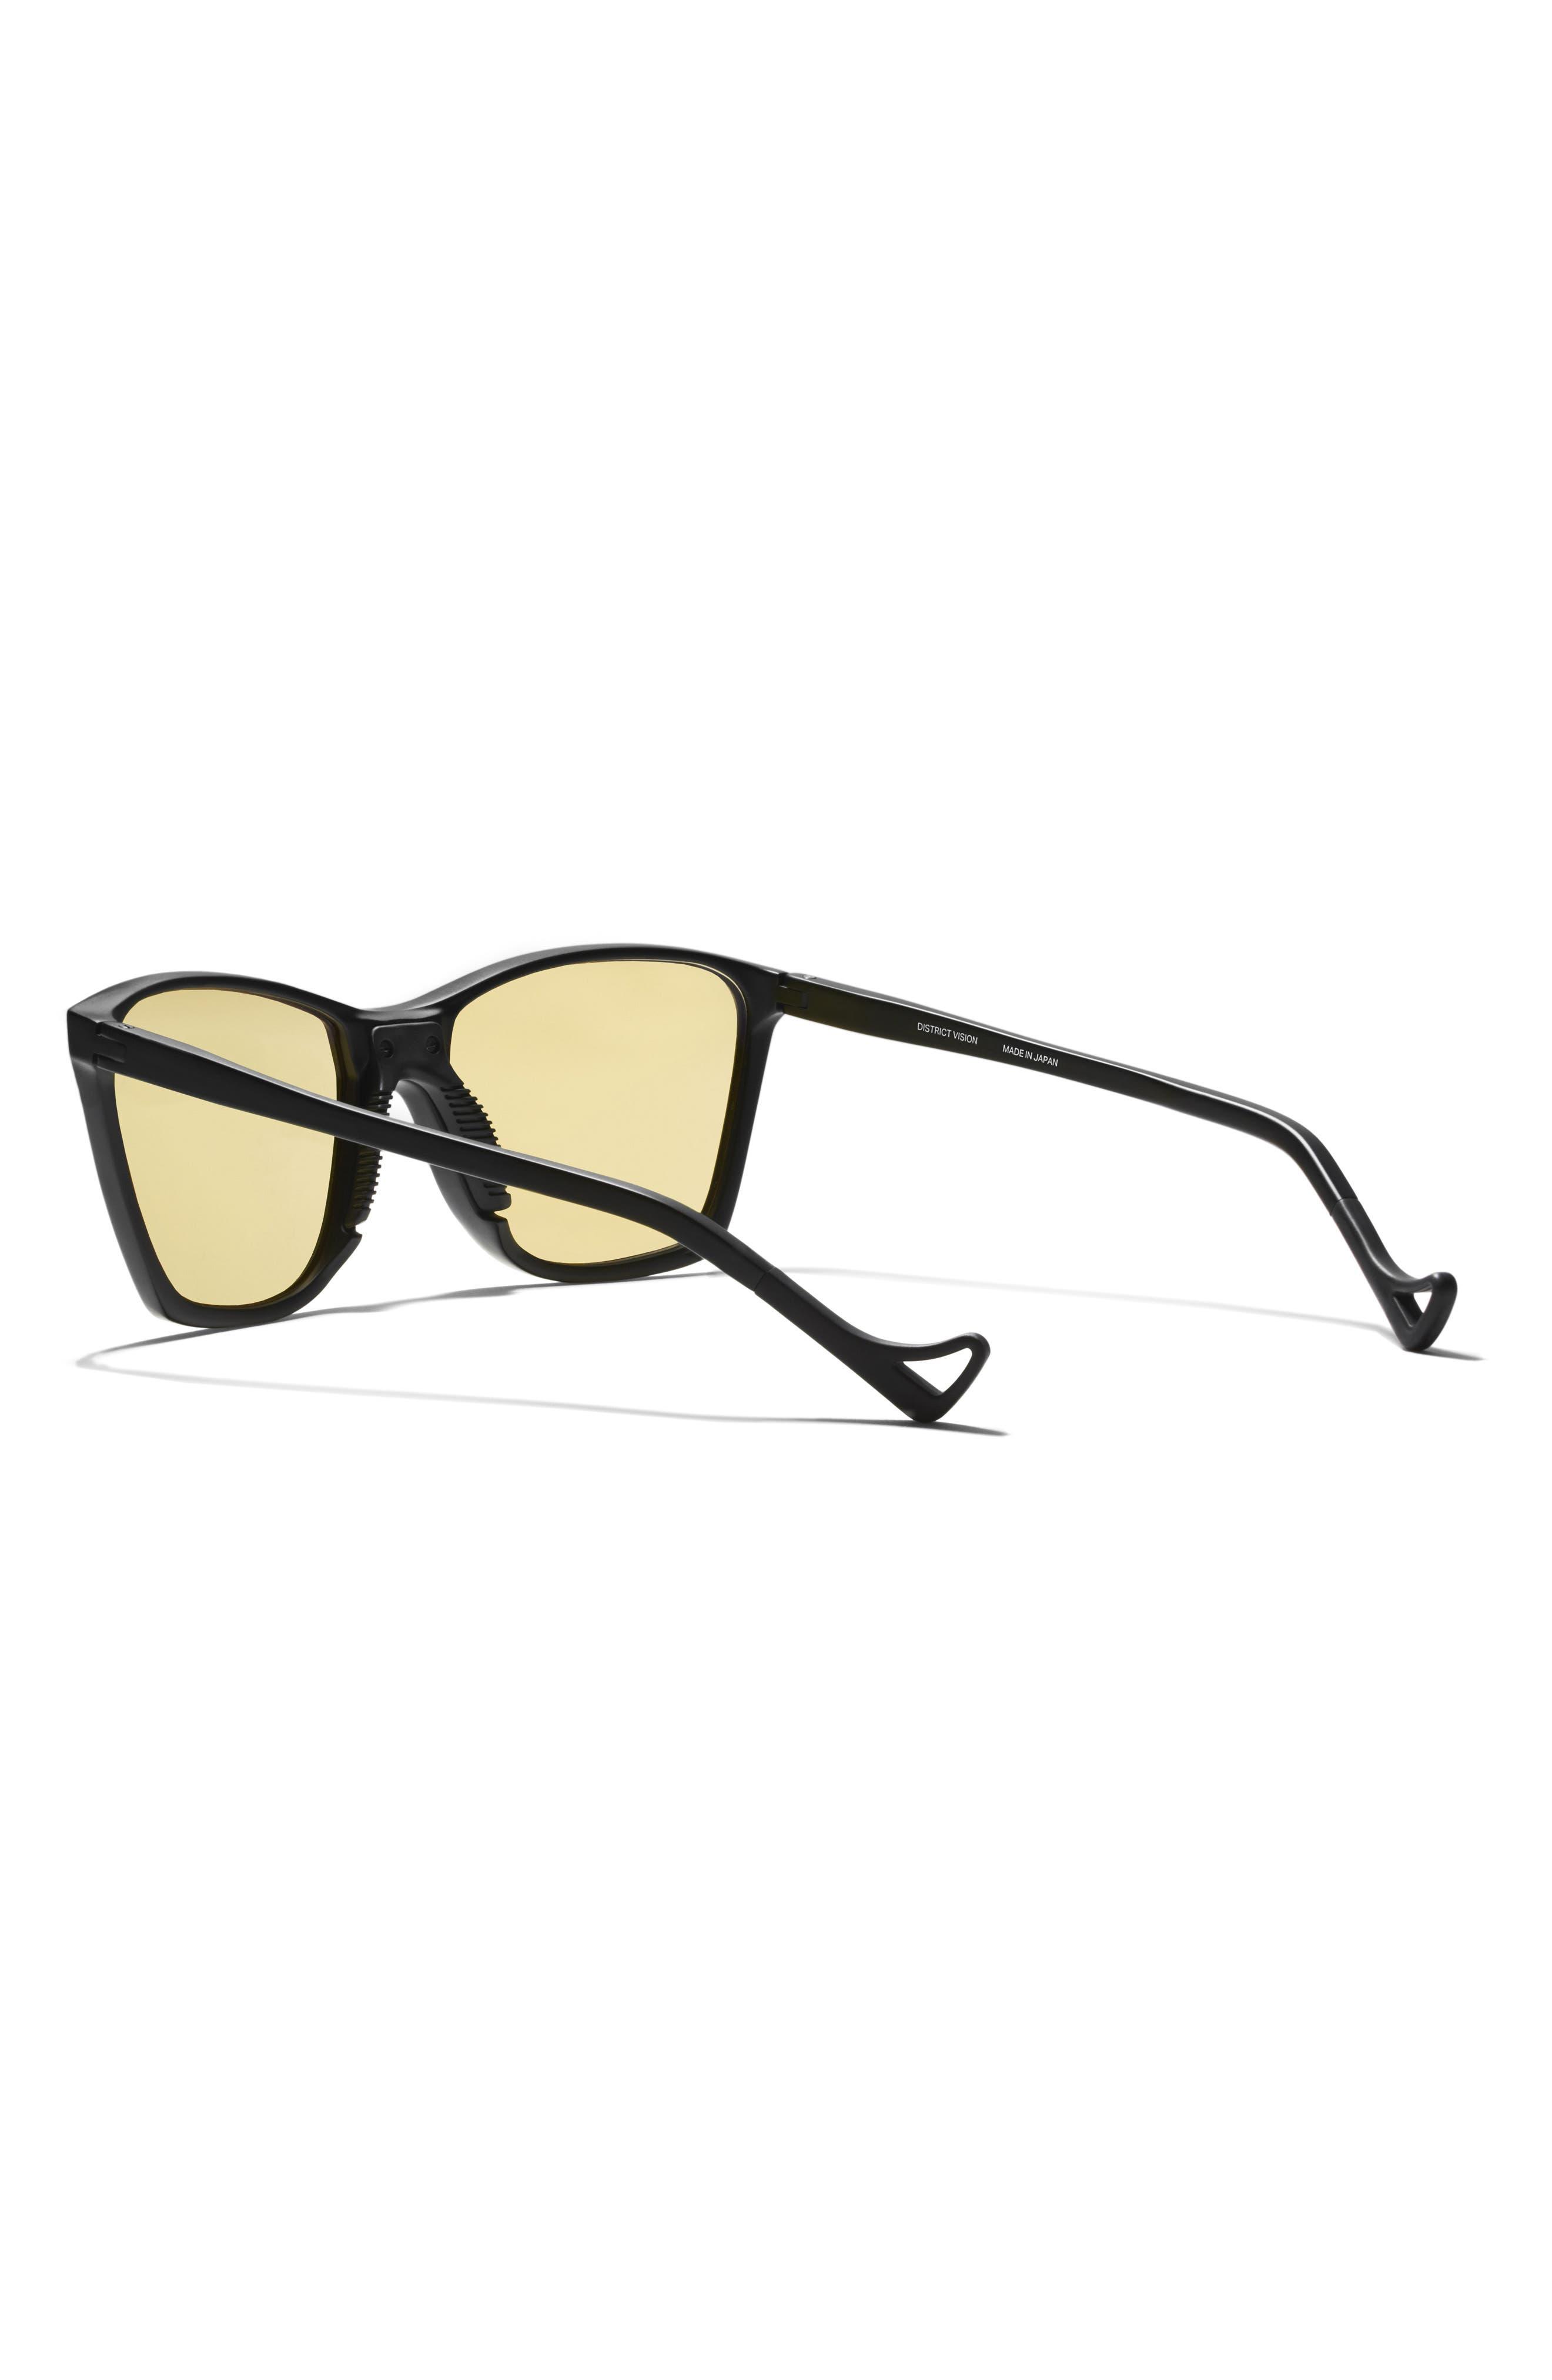 Keiichi Standard 55mm Sunglasses,                             Alternate thumbnail 3, color,                             BLACK/ YELLOW